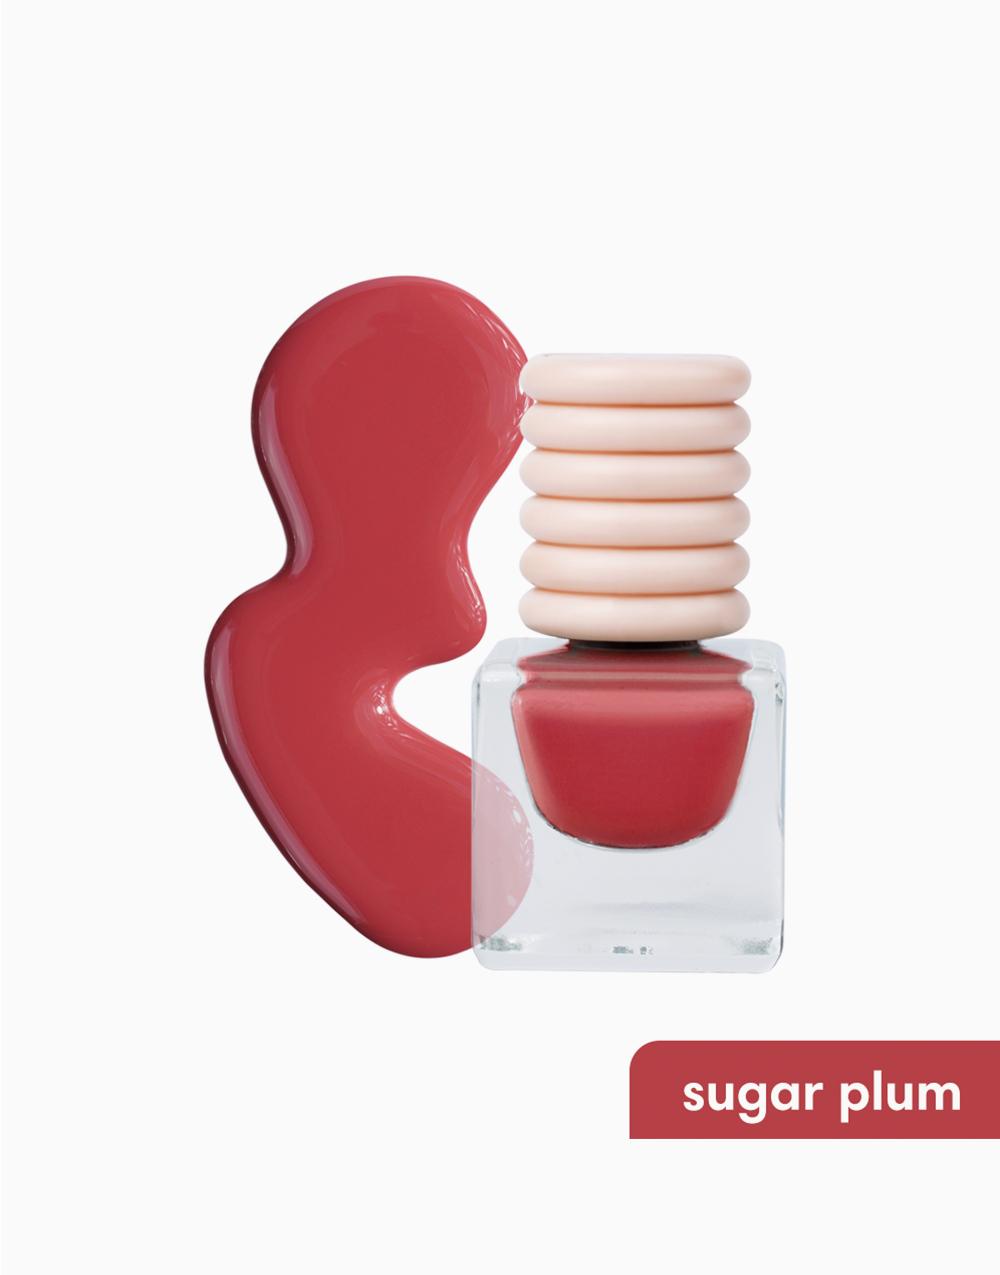 Sunnies Face Play Paint [Vegan Quick-Dry Nail Polish] (Sugar Plum) by Sunnies Face